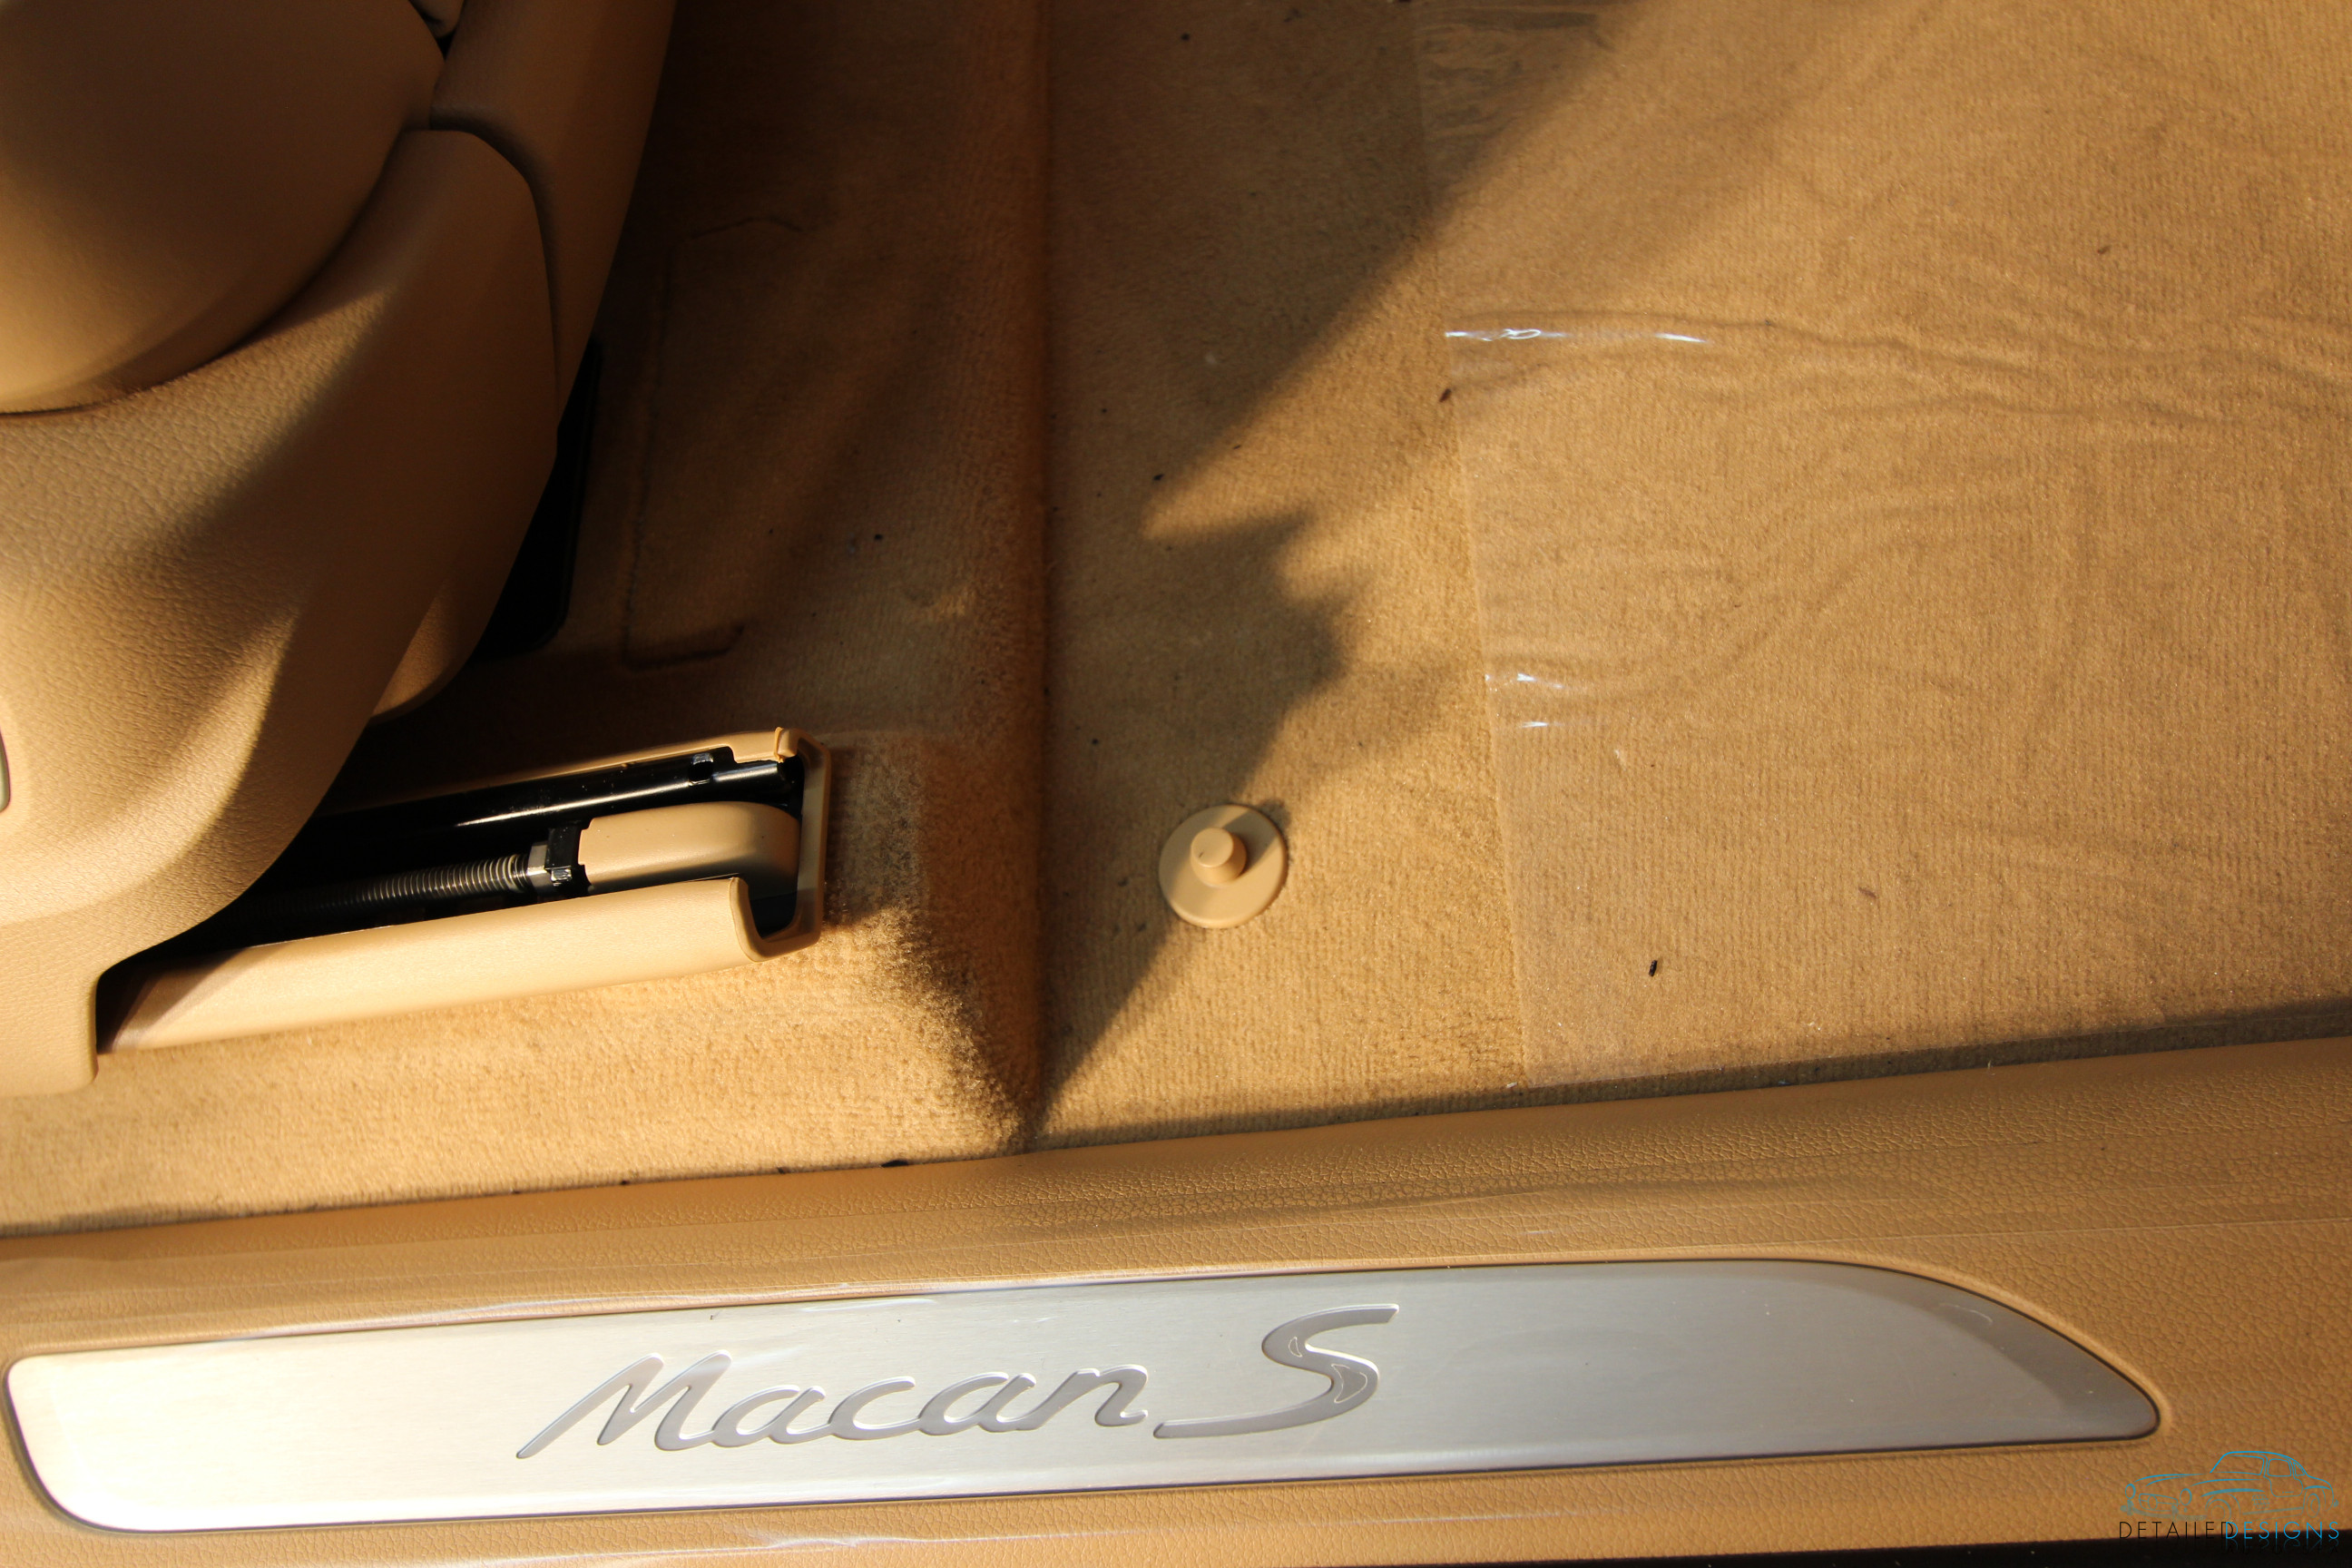 Atlanta Porsche Detailing And Opti Coat Pro Installation On New Macan S Detailed Designs Auto Spa